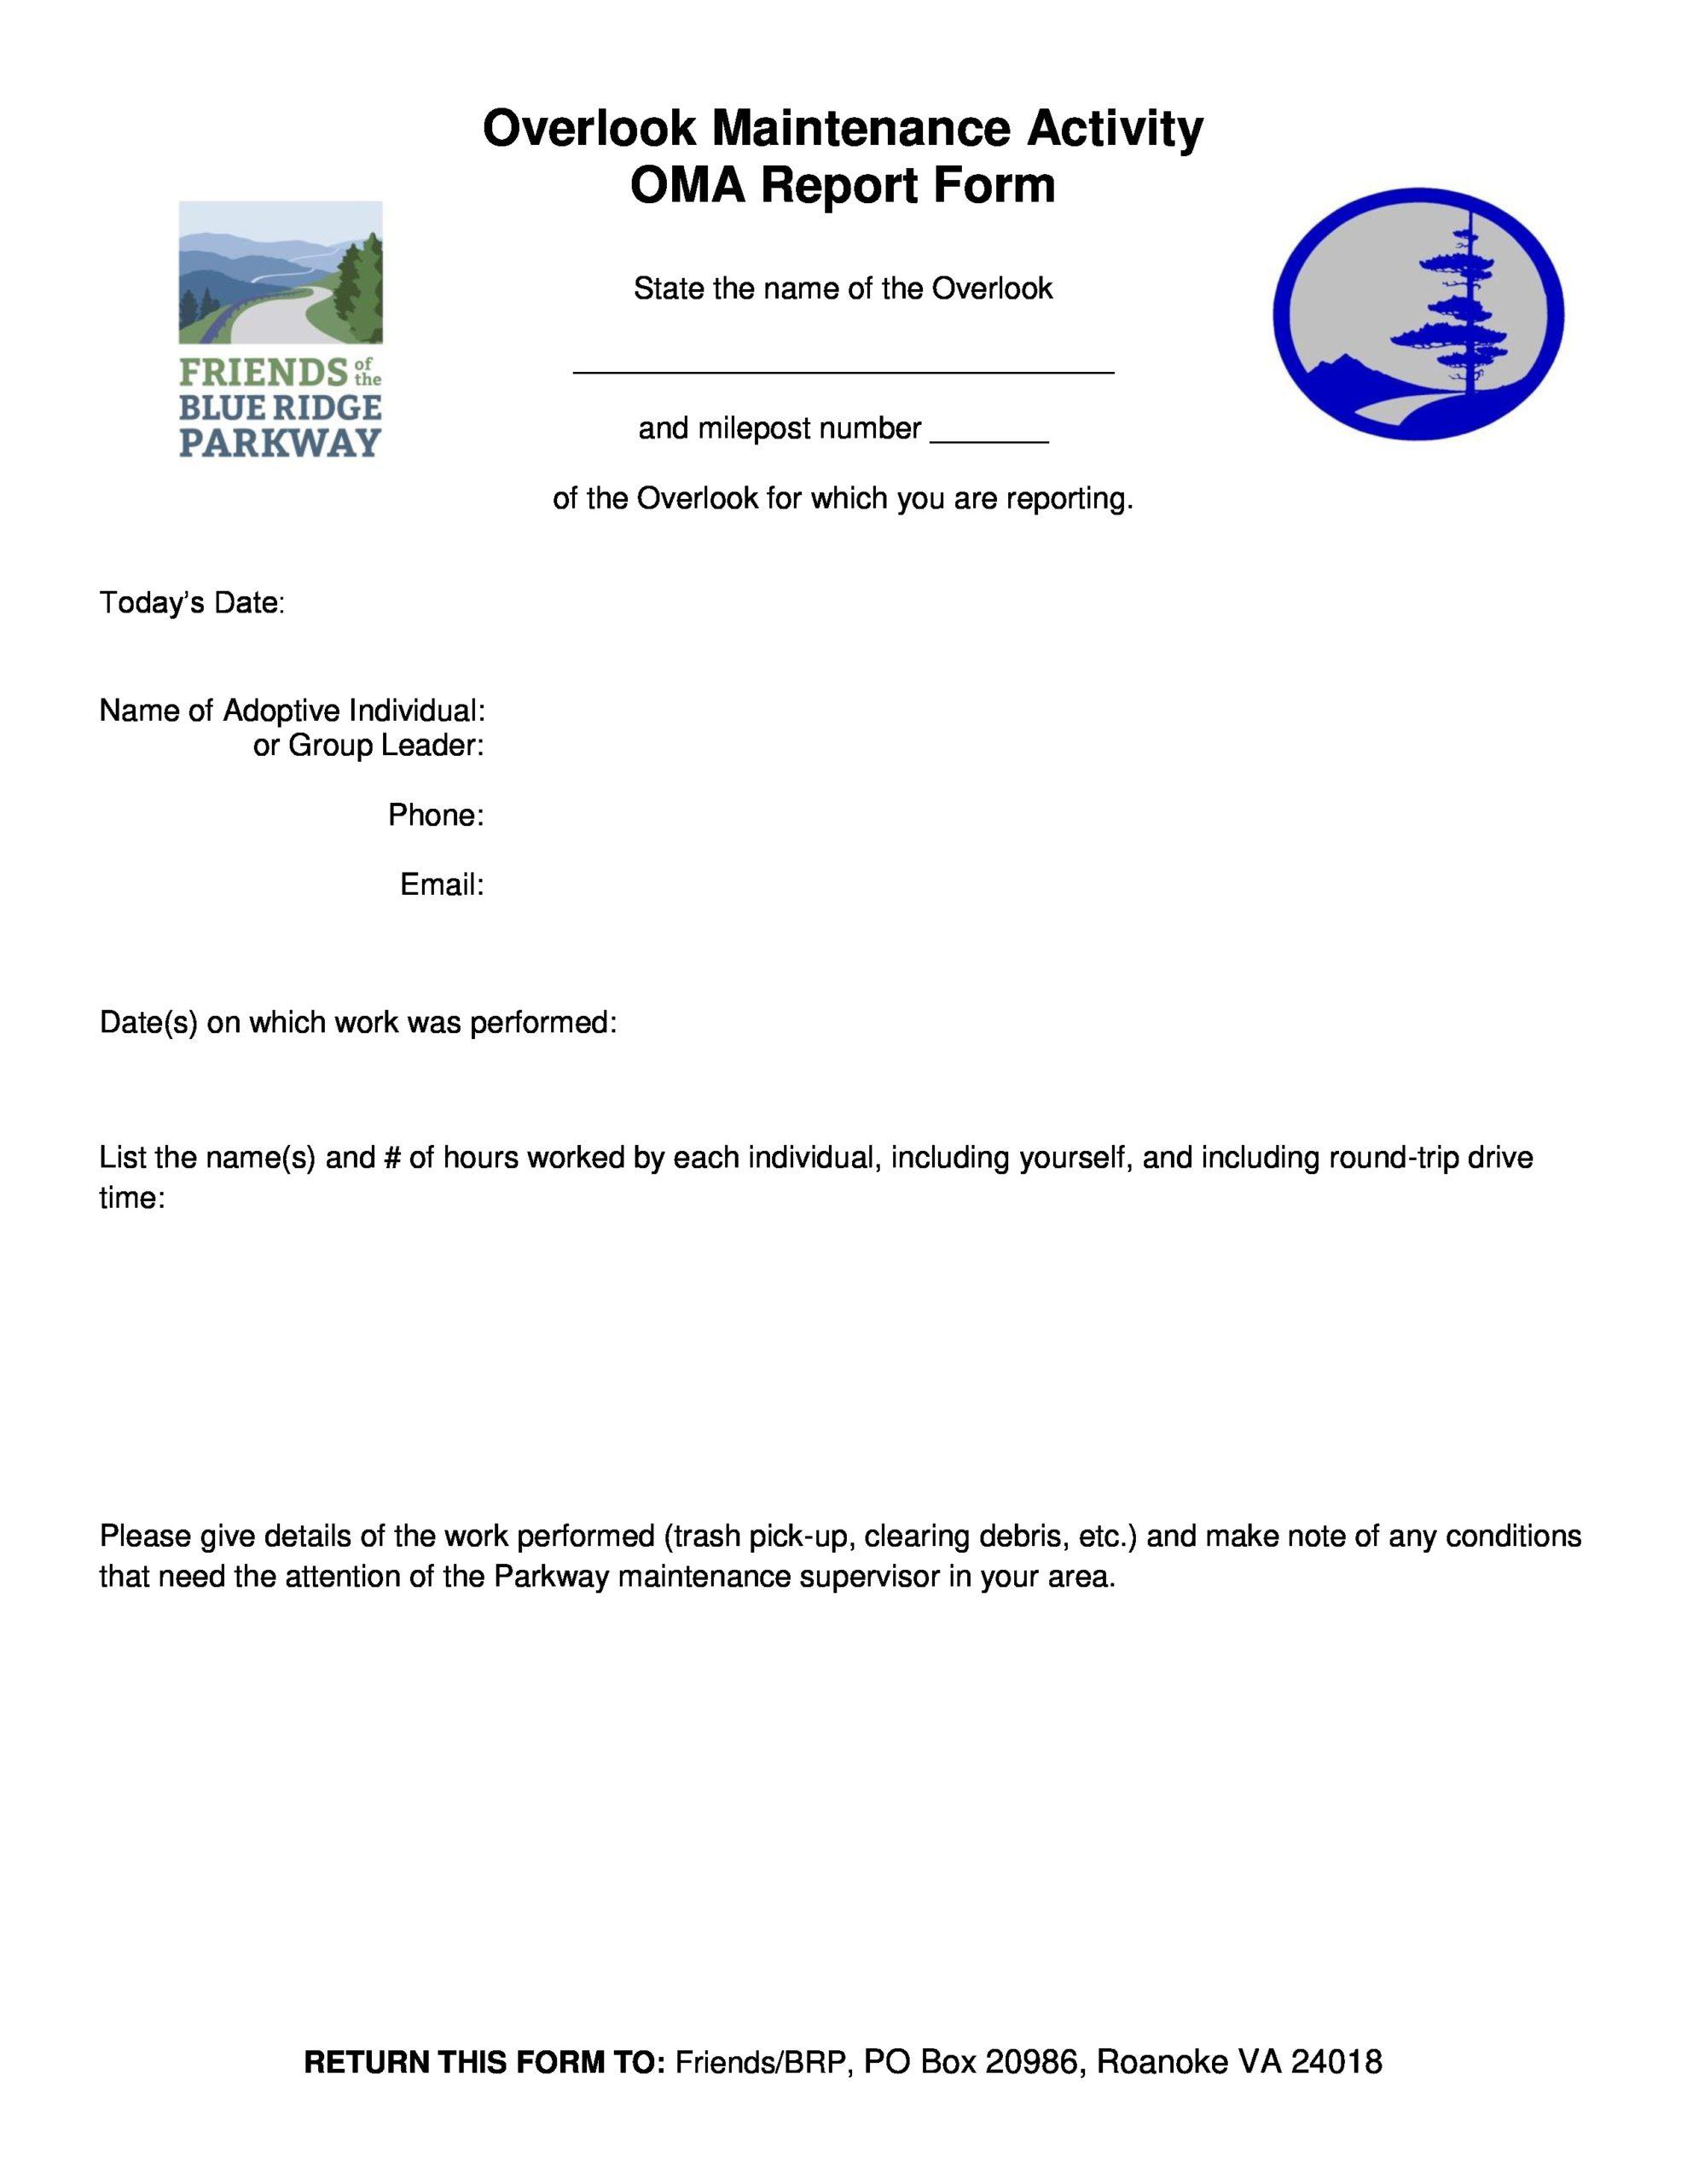 Free maintenance report form 30